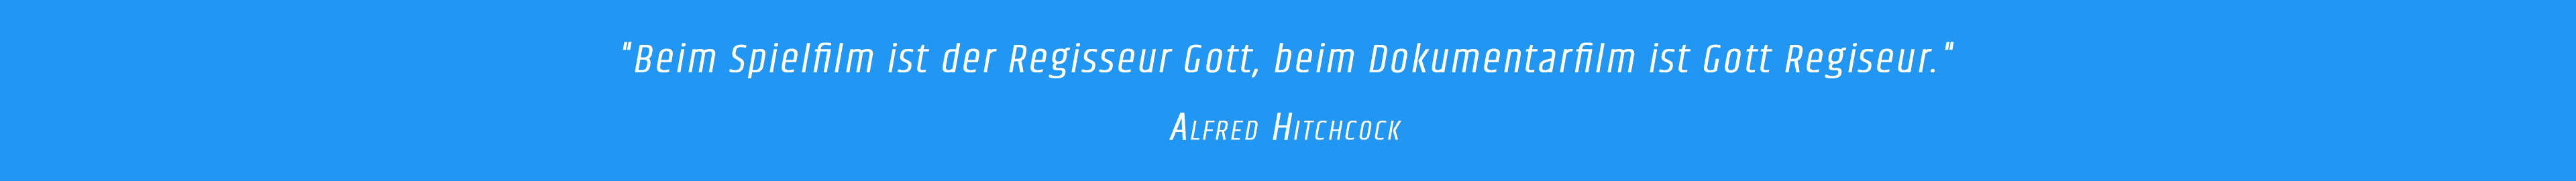 Zitat - Alfred Hitchcock